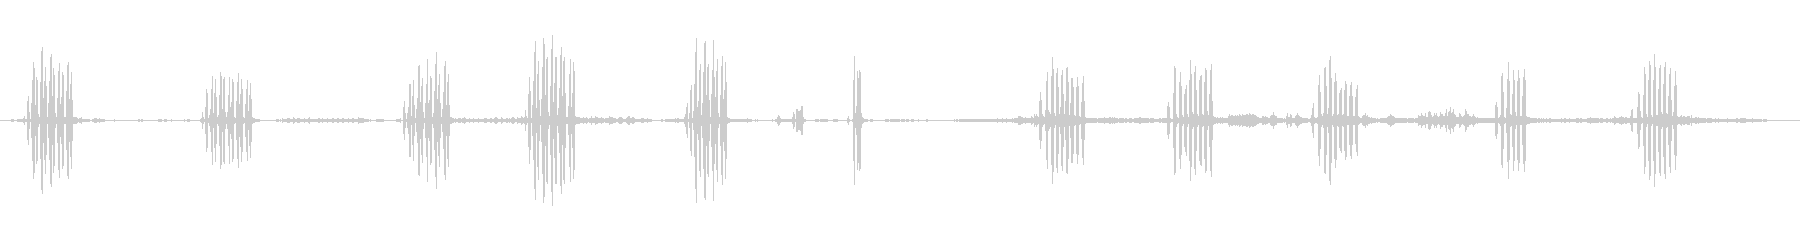 carbonero-mellere...の未再生の波形